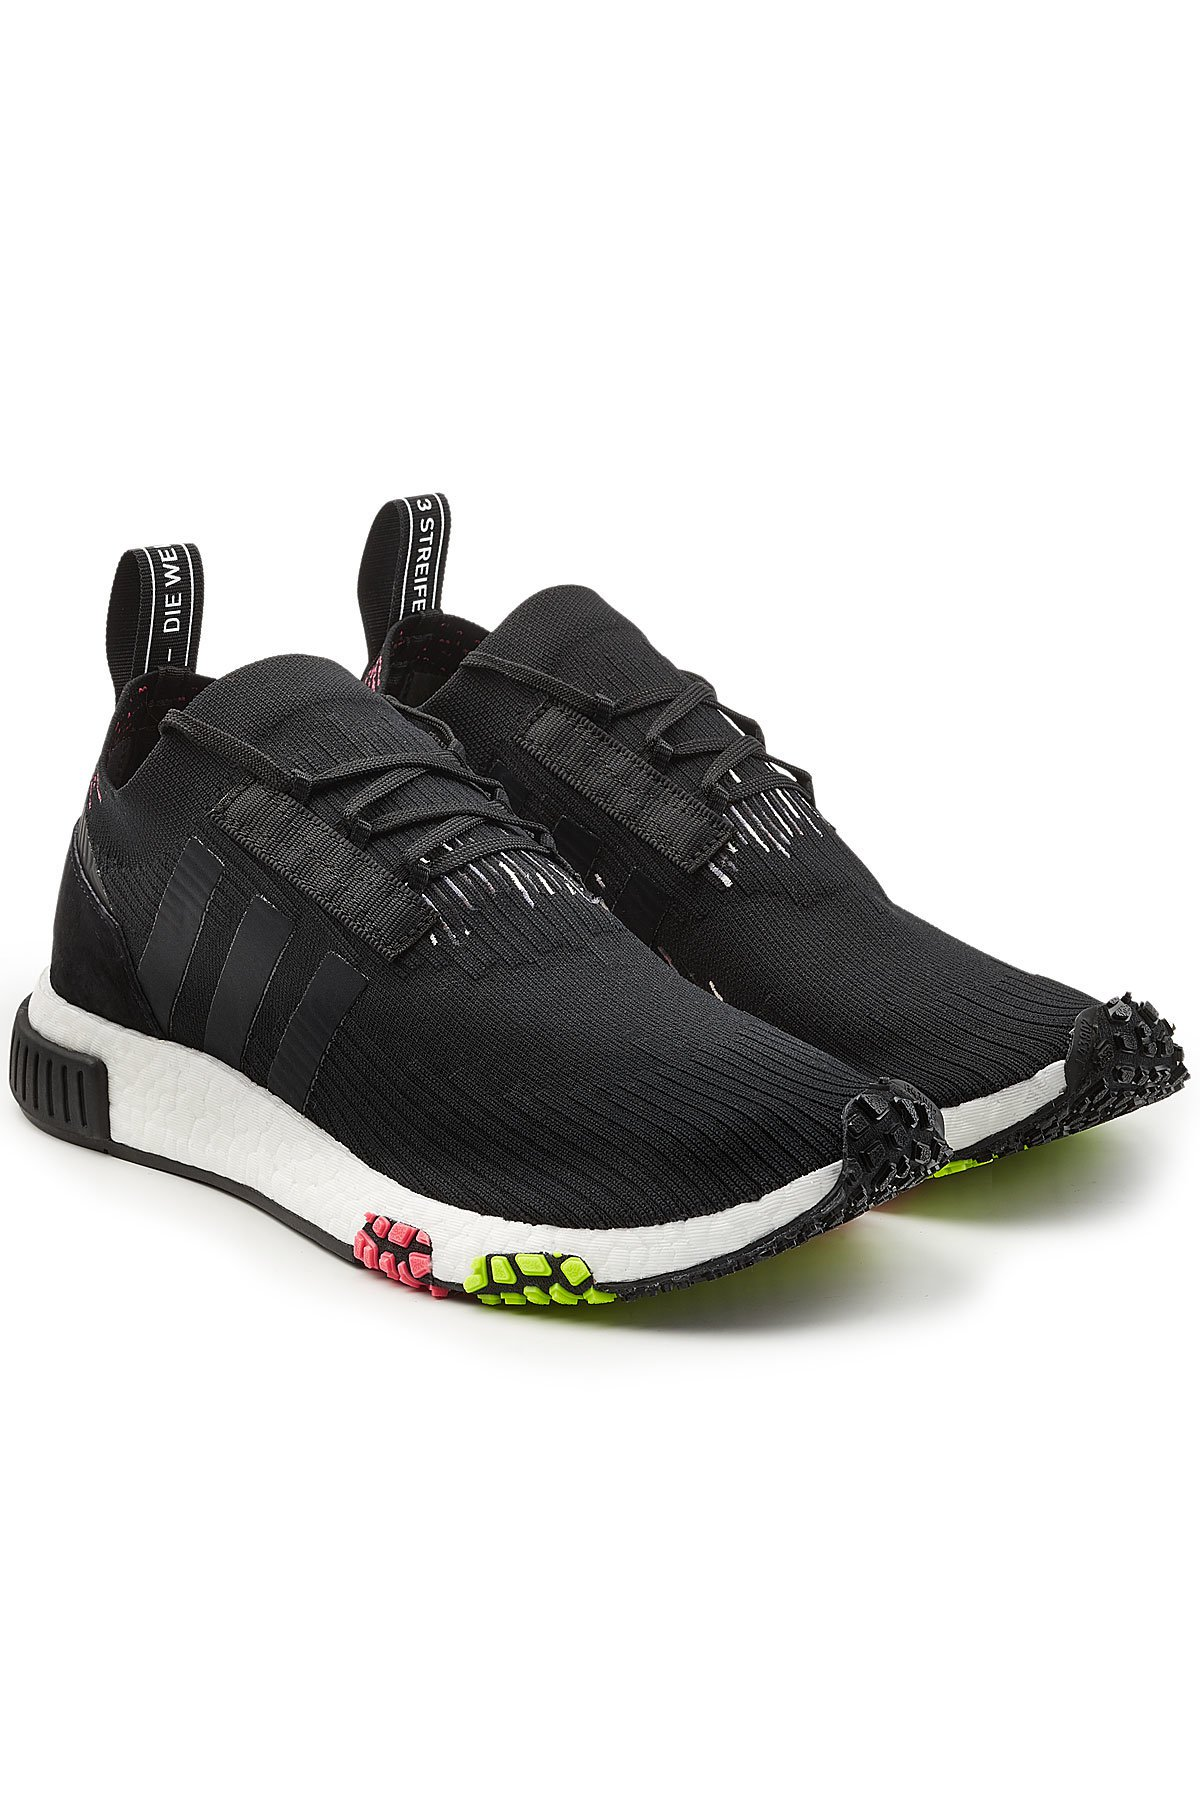 NMD Racer Primeknit Sneakers Gr. UK 5.5